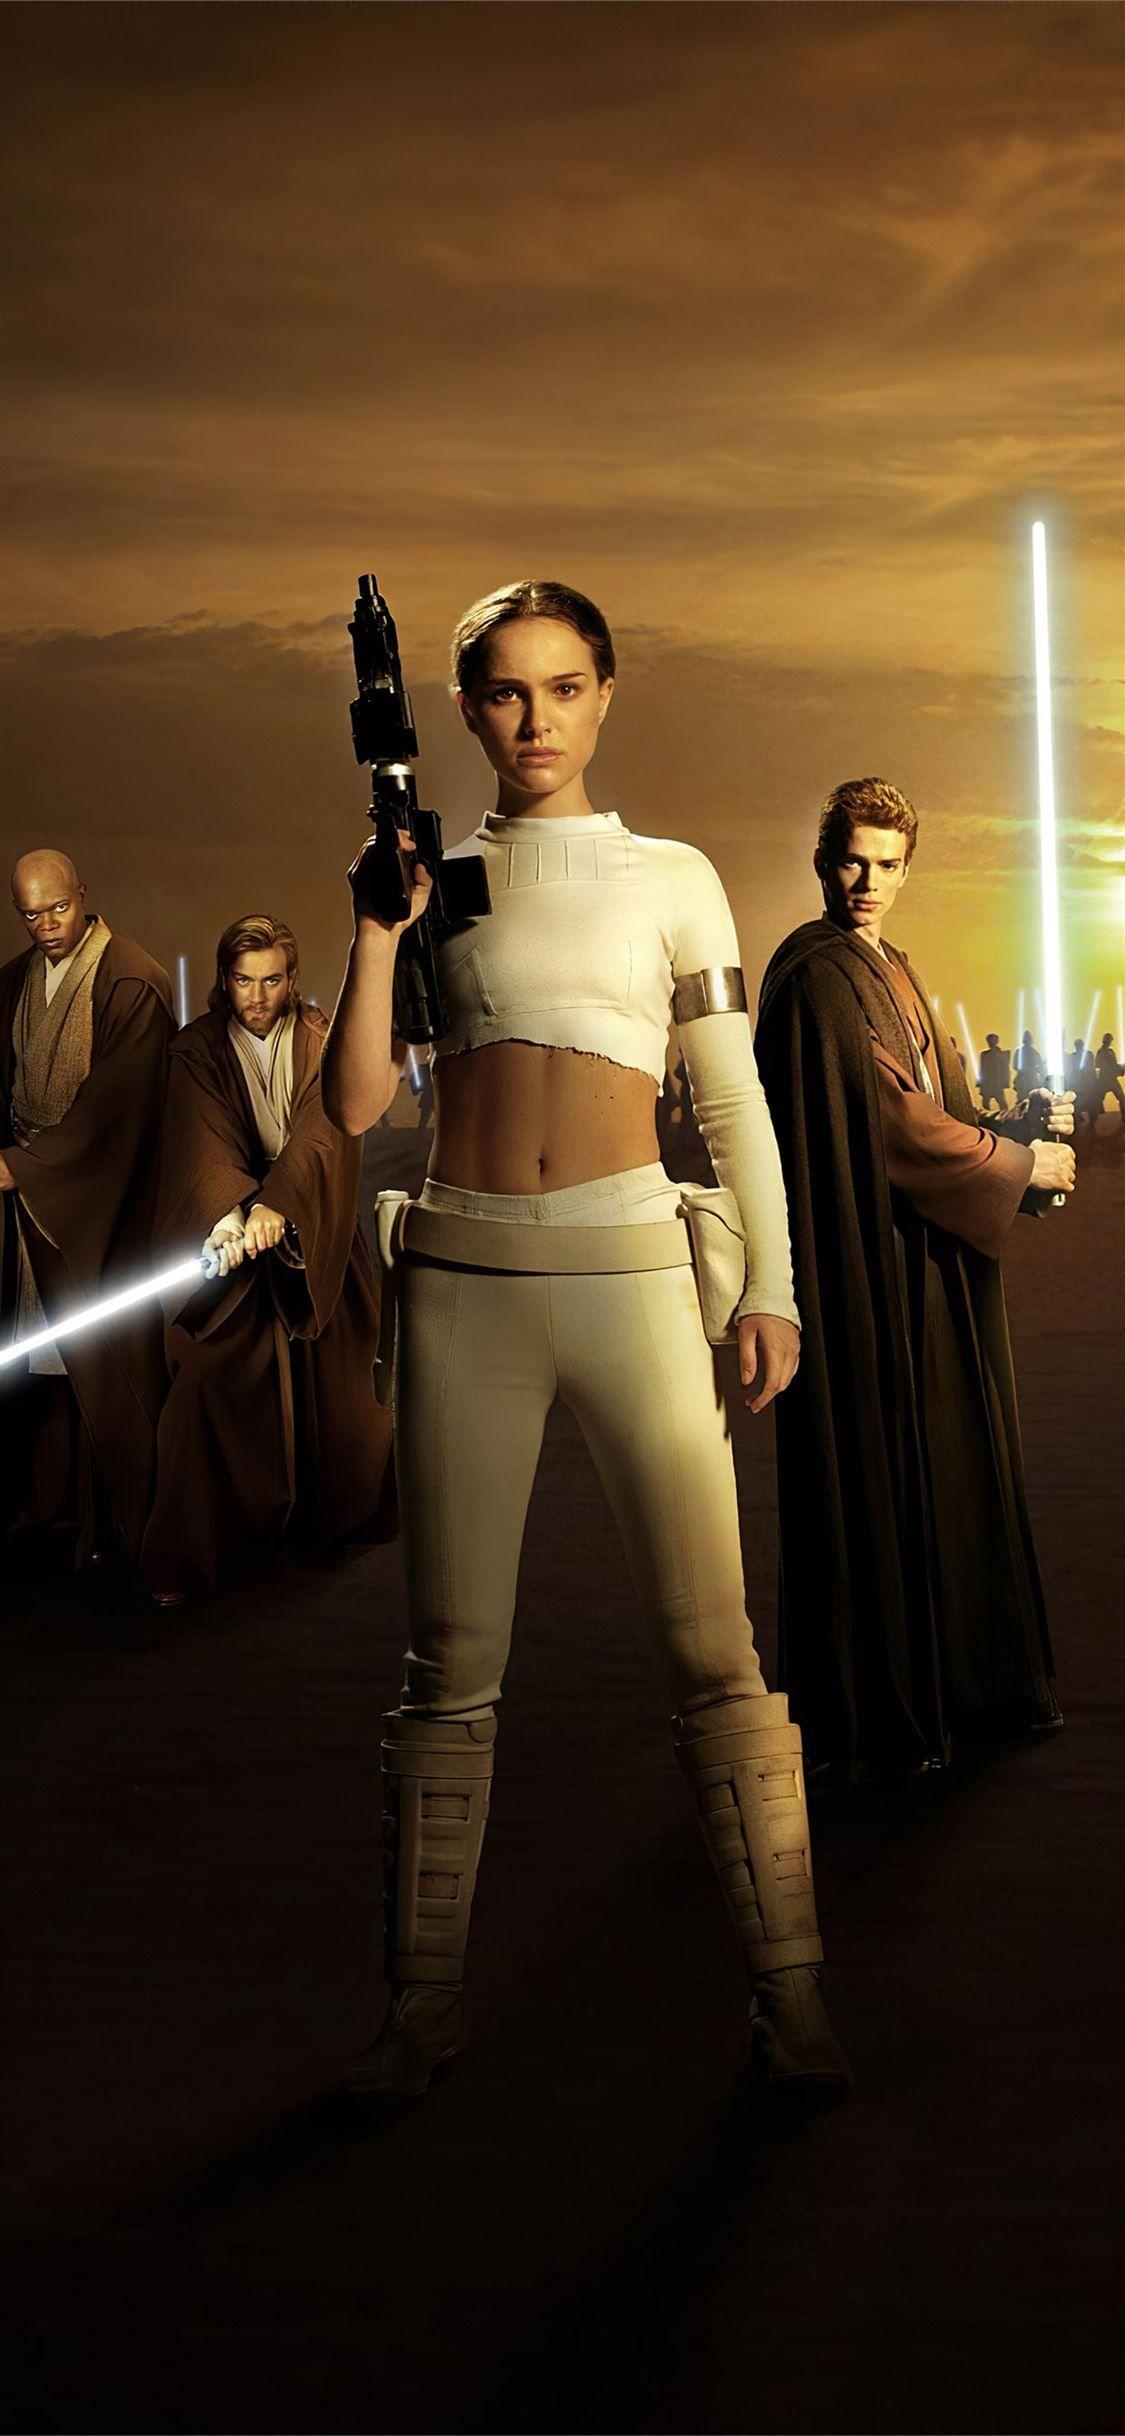 Star Wars Episode Ii Attack Of The Clones Natalie Starwars Movies 4k Natalieportman Poster I In 2020 Star Wars Episode Ii Star Wars Actors Star Wars Episodes